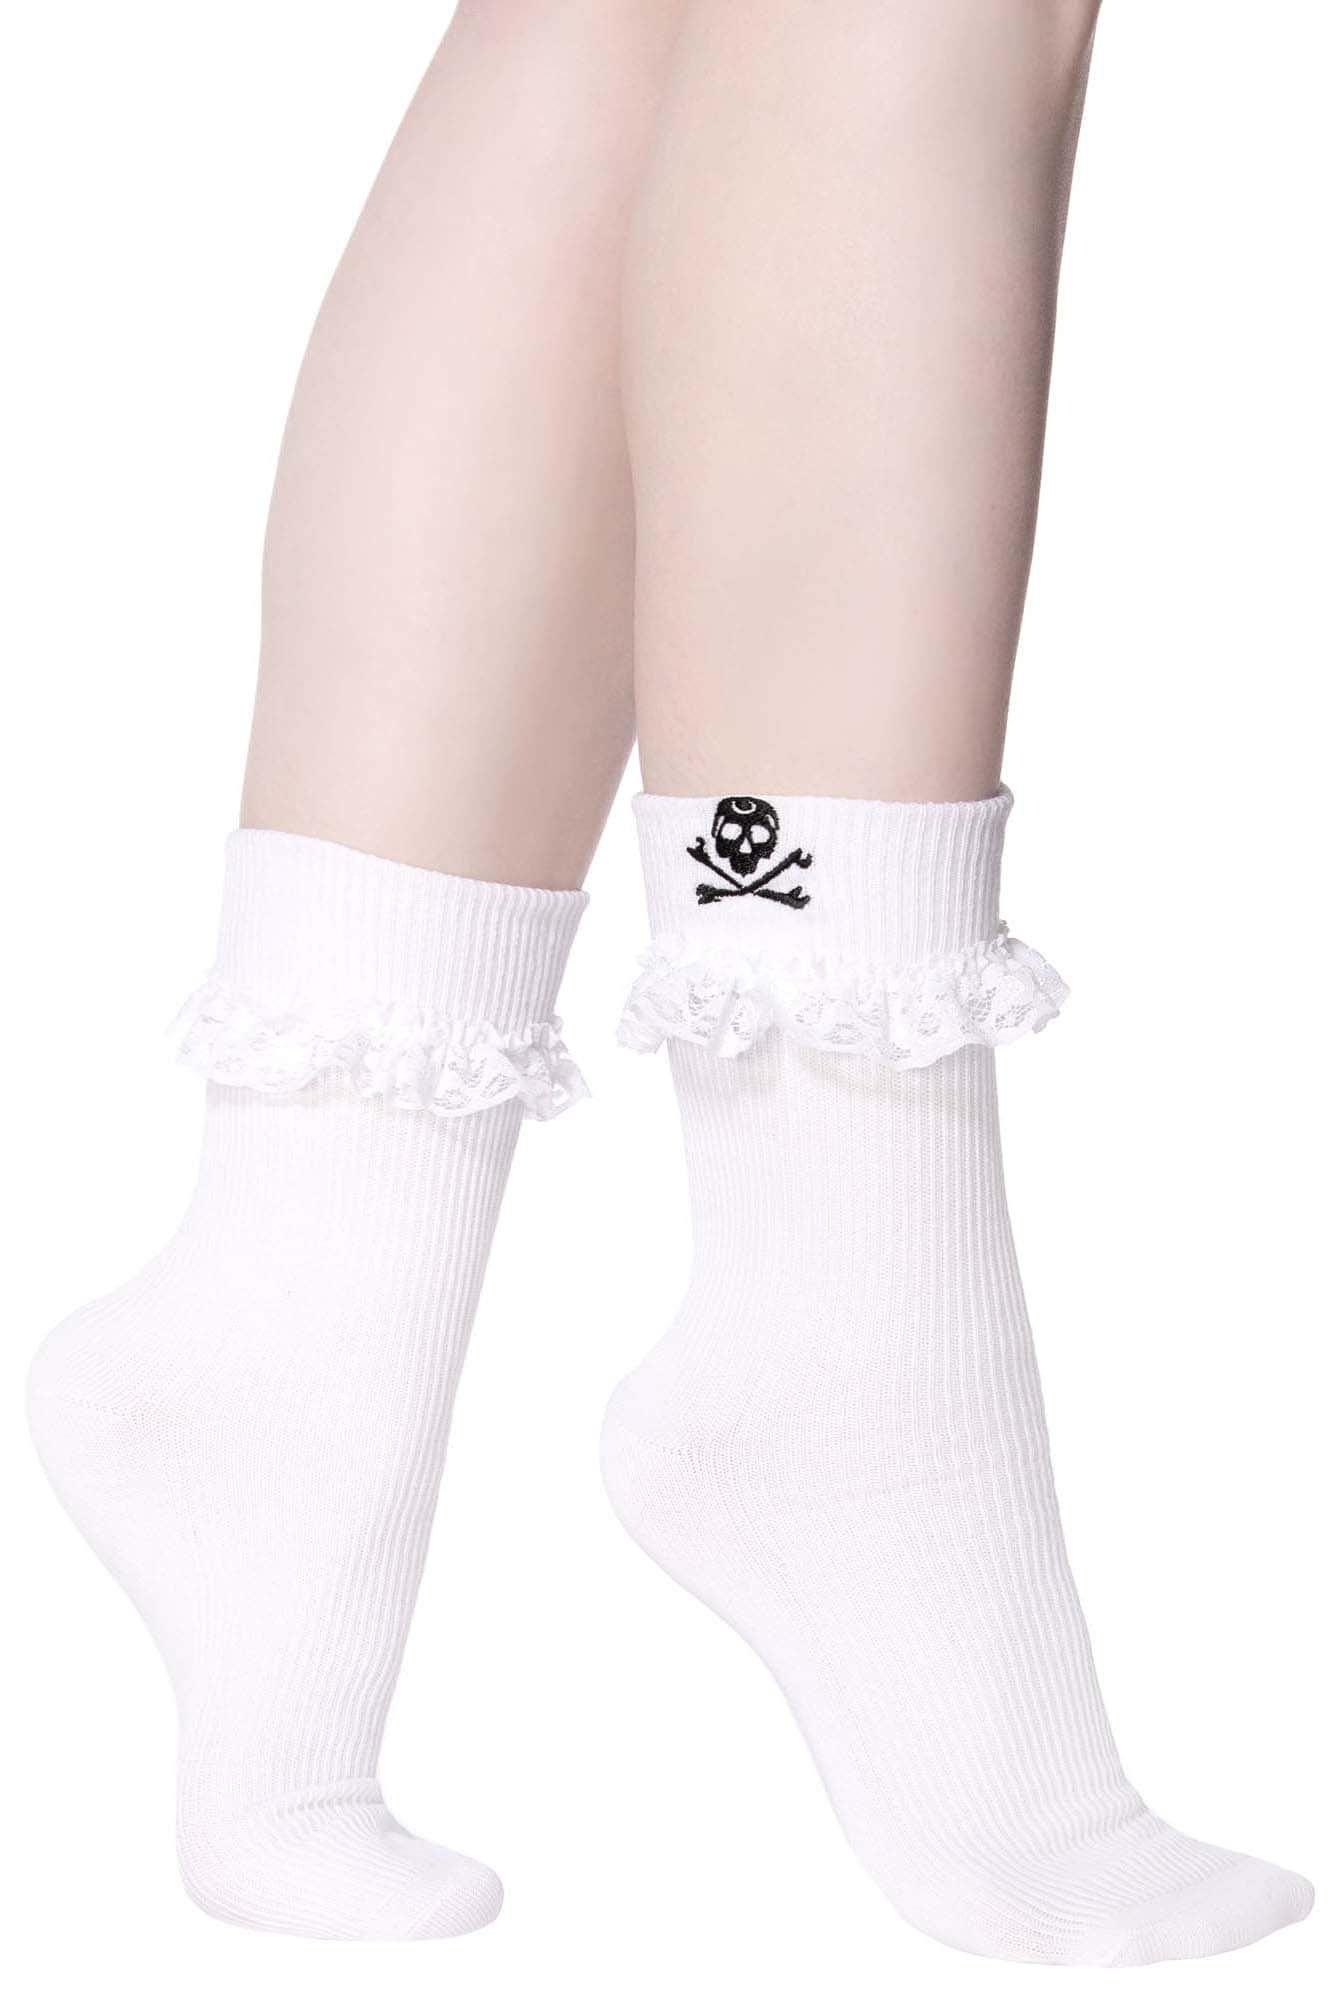 KS02830_socquettes-chaussettes-gothique-glam-rock-killstar-riot